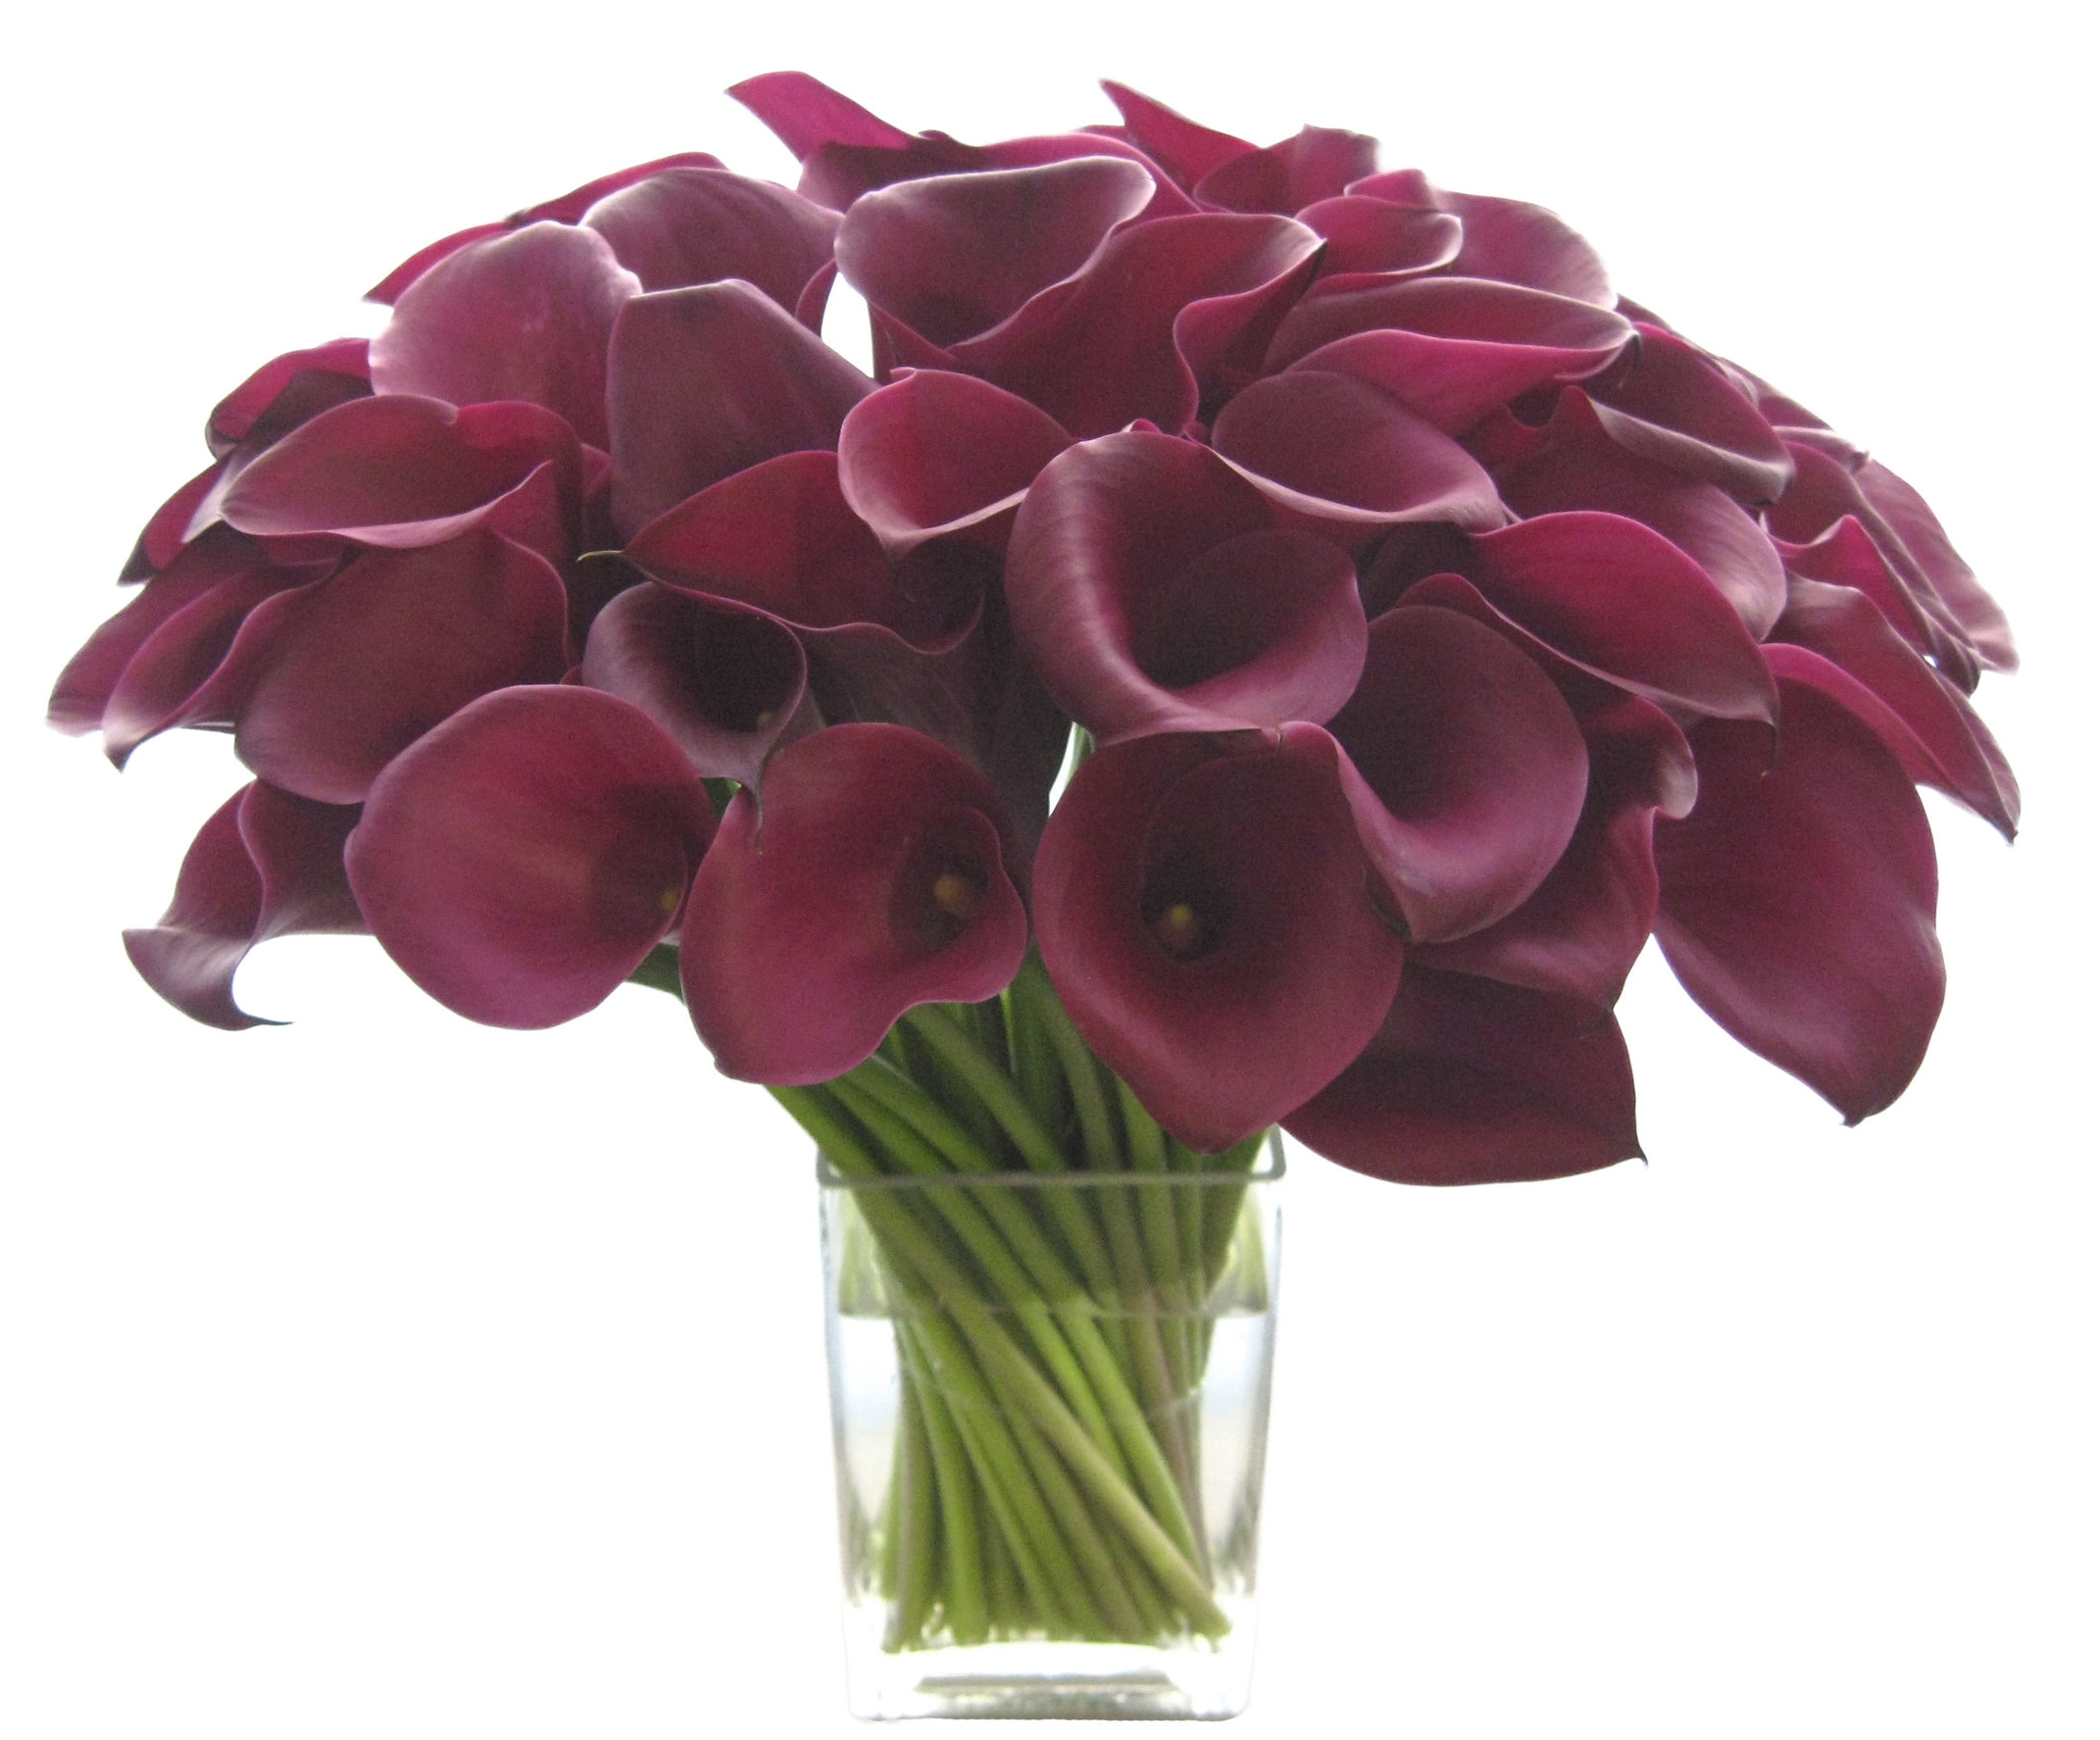 Burgundy Callas start at $275